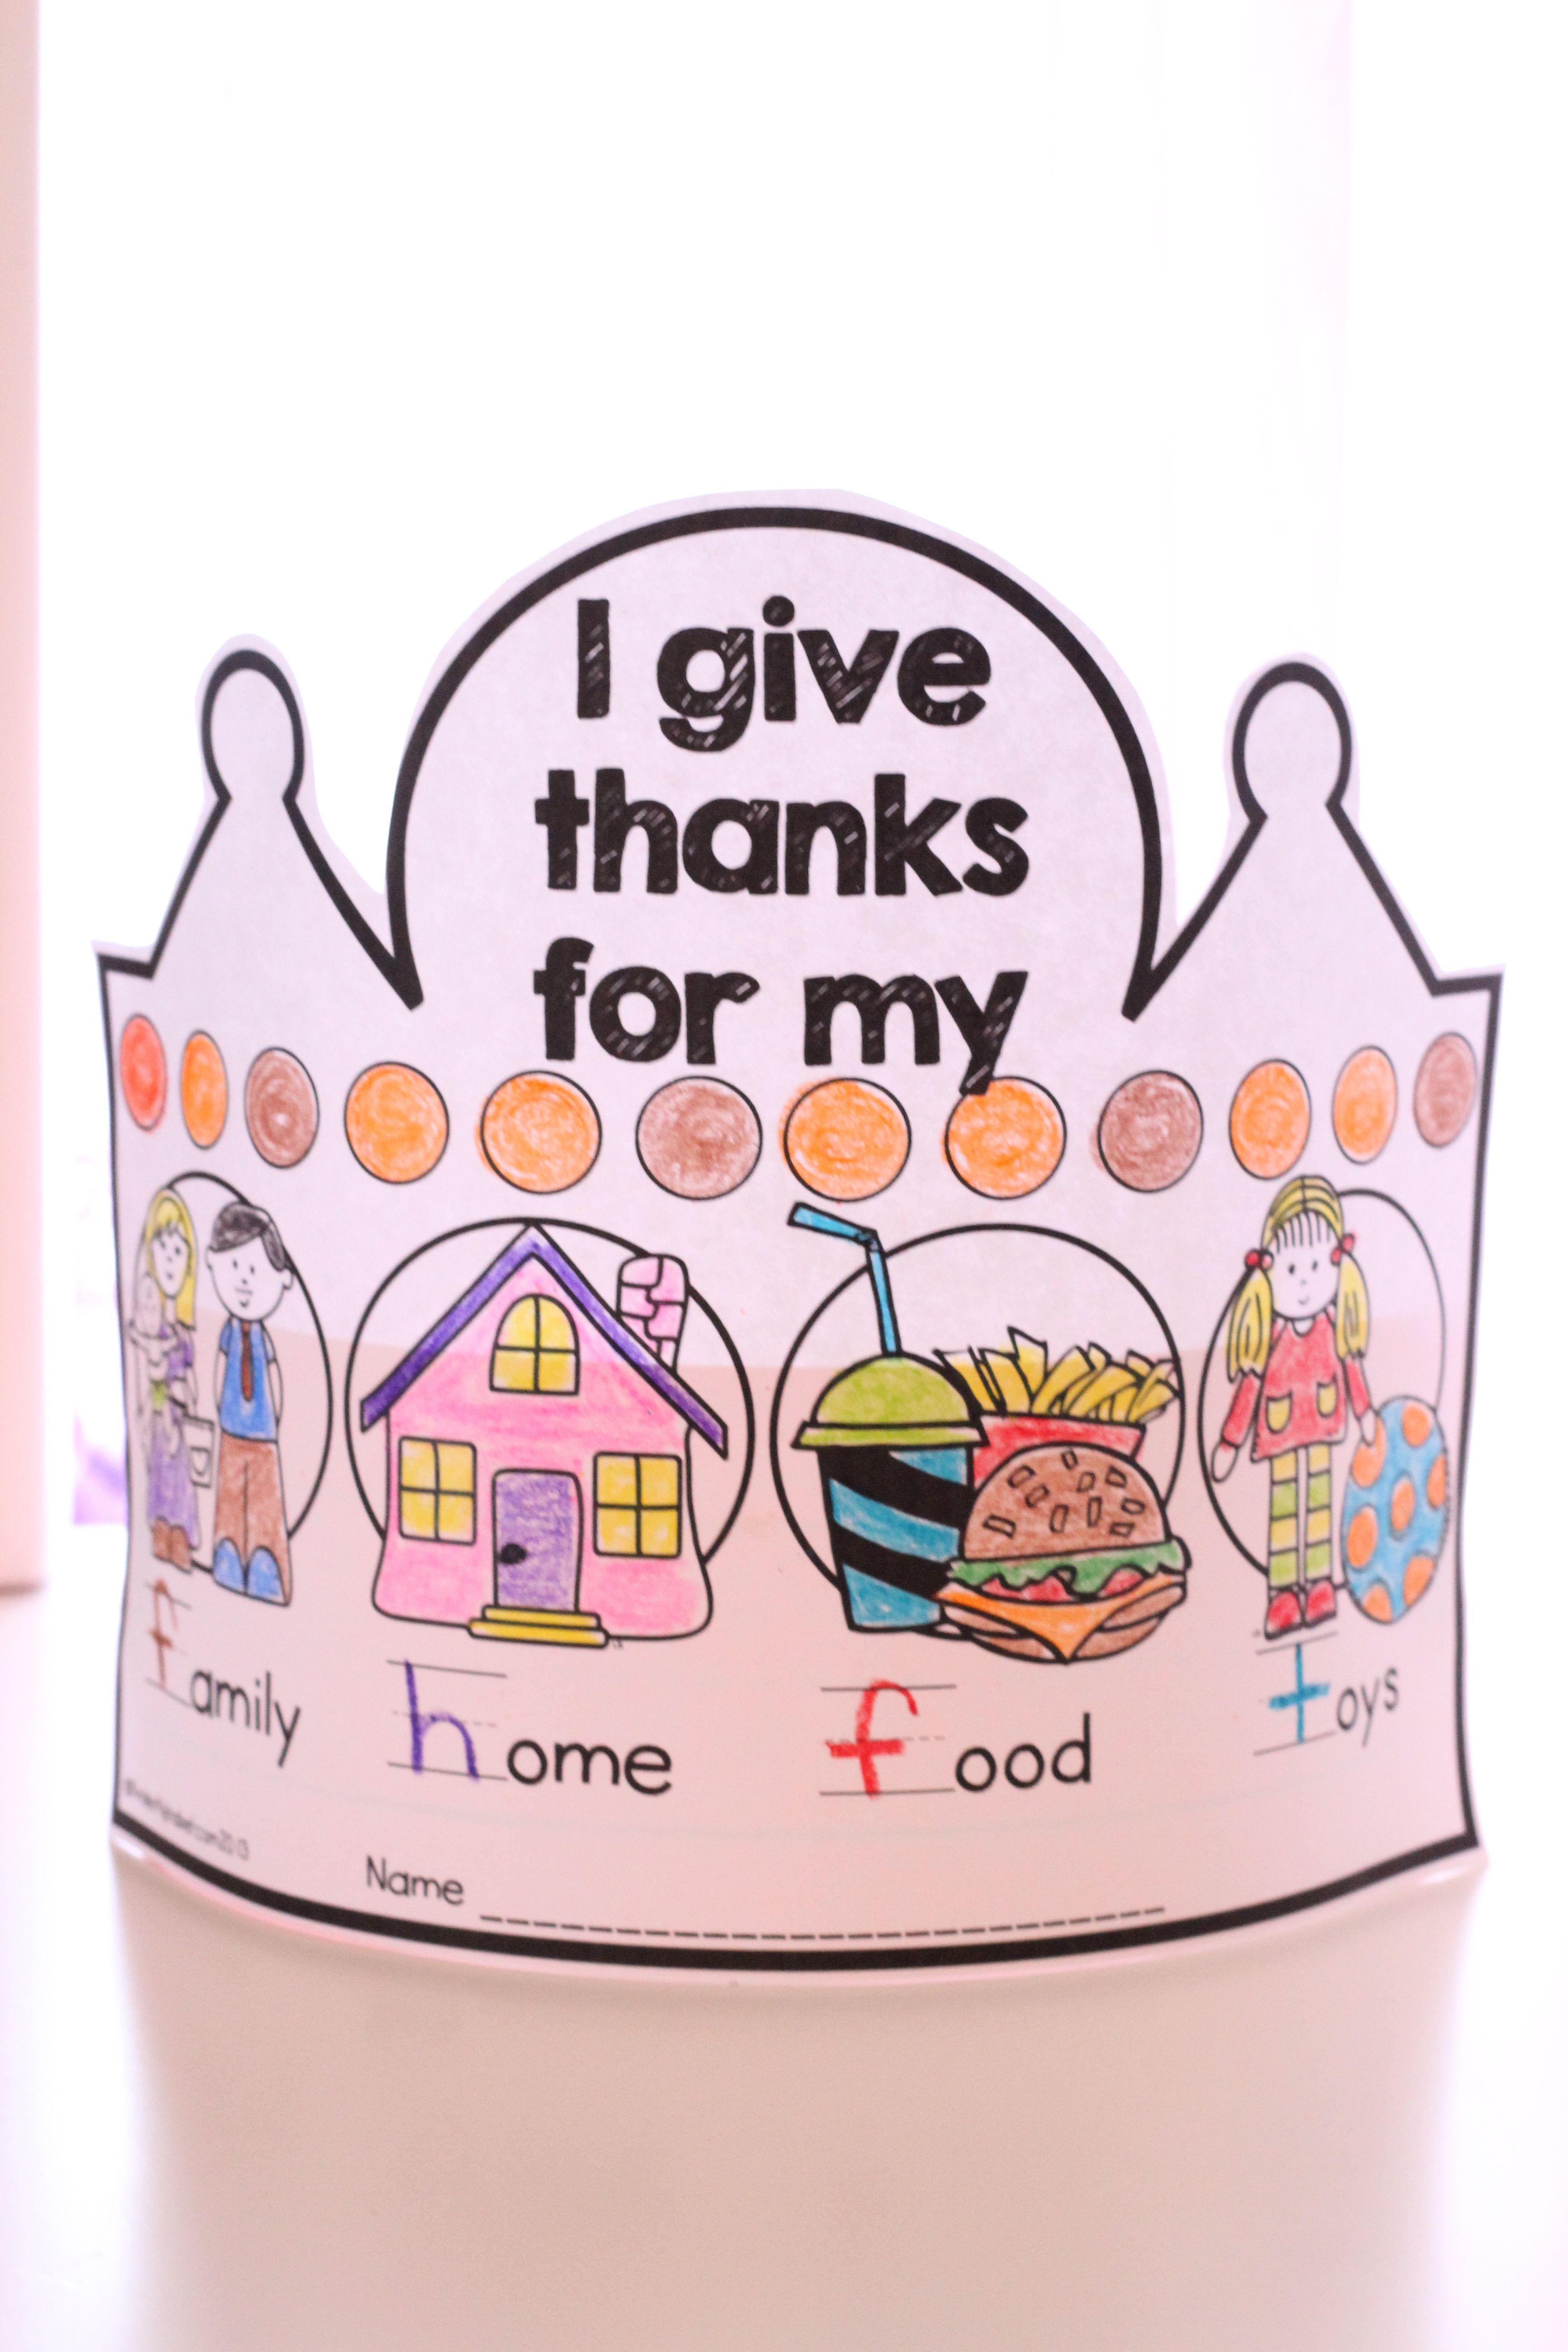 b49bd7d08f0a246a2a86c38f777cccef - Thanksgiving Video For Kindergarten